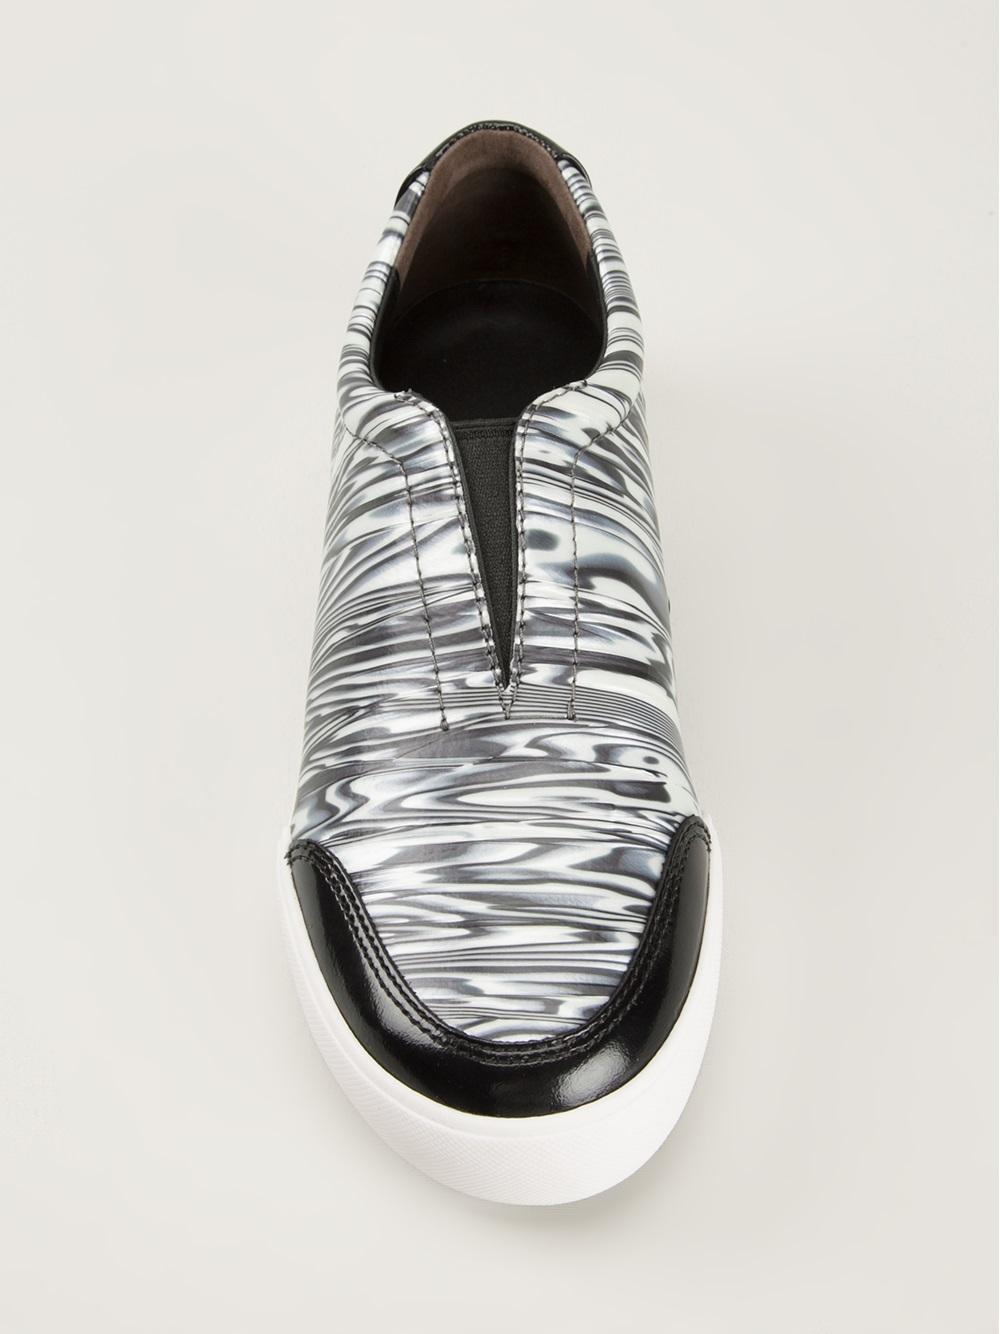 3.1 Phillip Lim Slip On Sneakers in Black